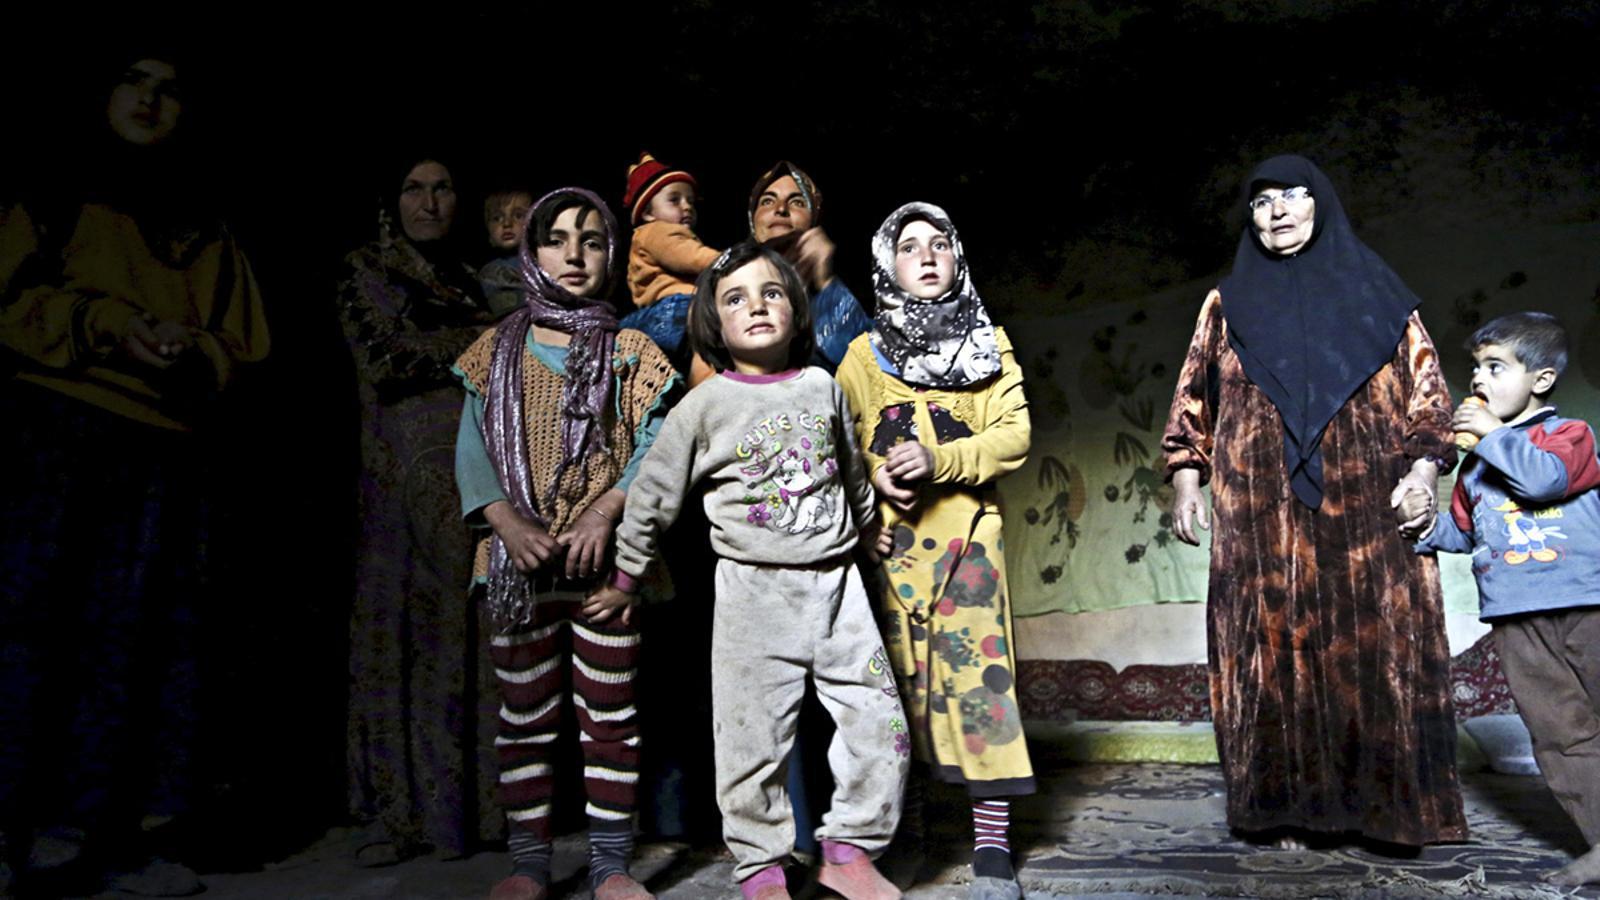 REFUGIADOS-UE II - Página 2 Desplacats-interns-improvisat-Om-Siria_1759634187_39425957_766x565